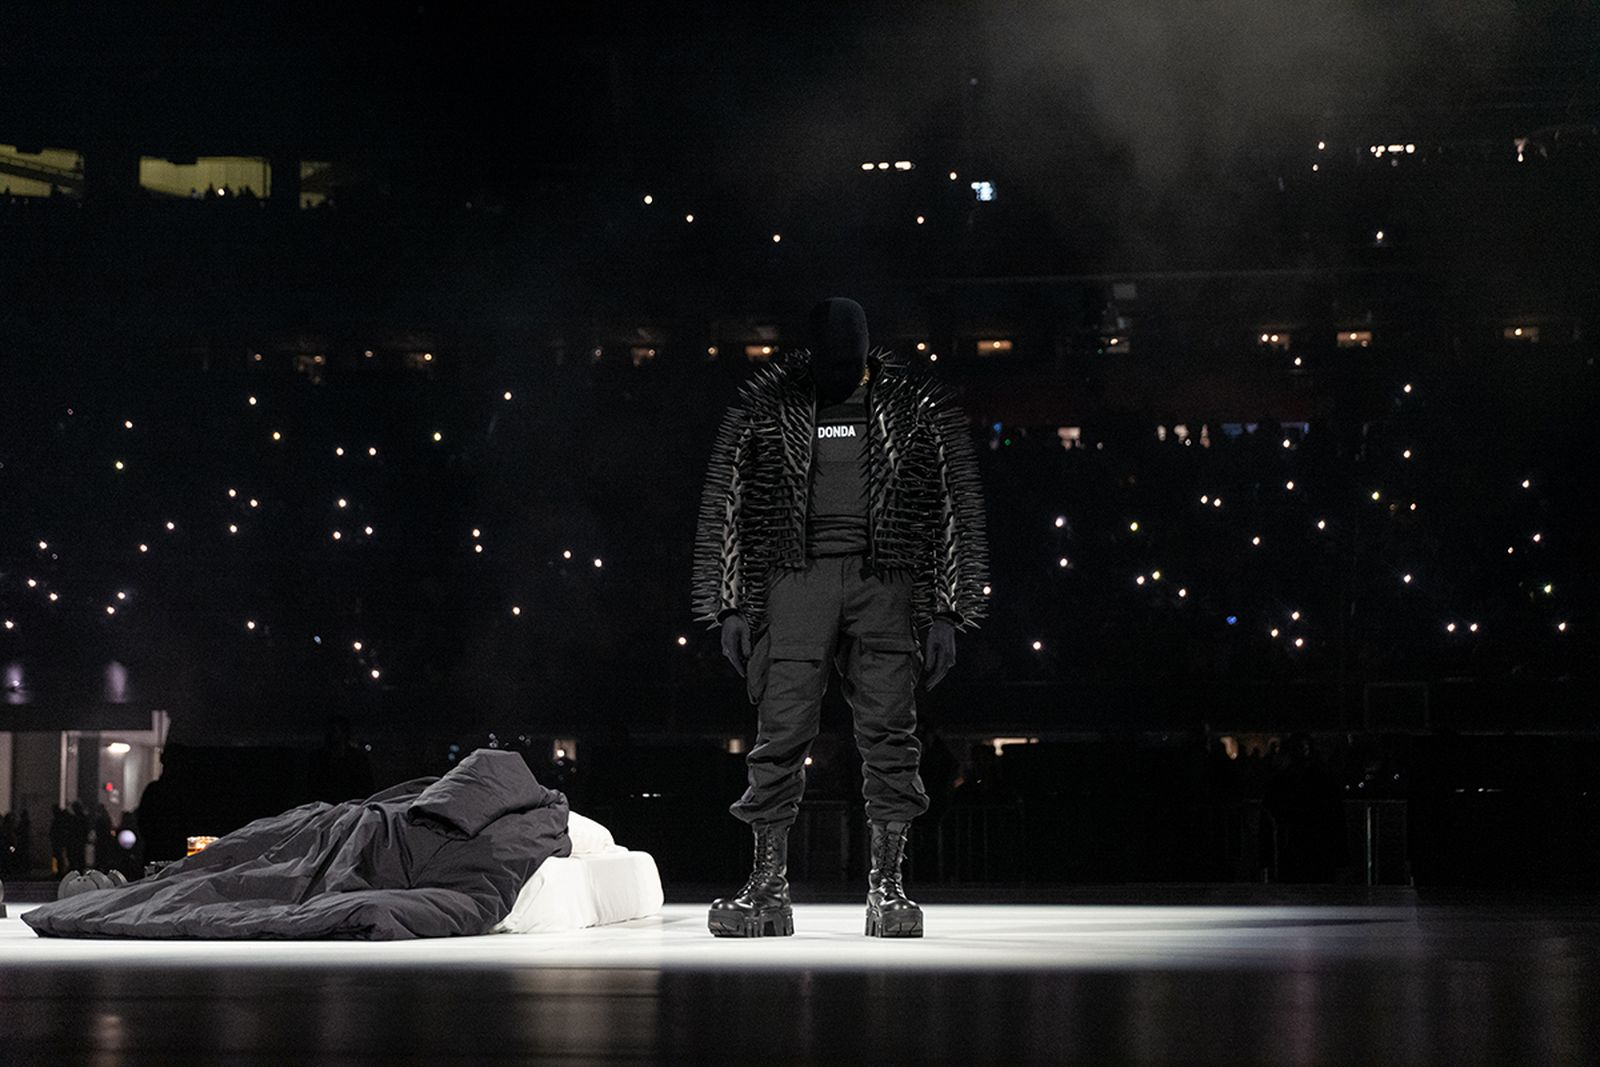 Kanye West 'DONDA' Album Release Performance Event